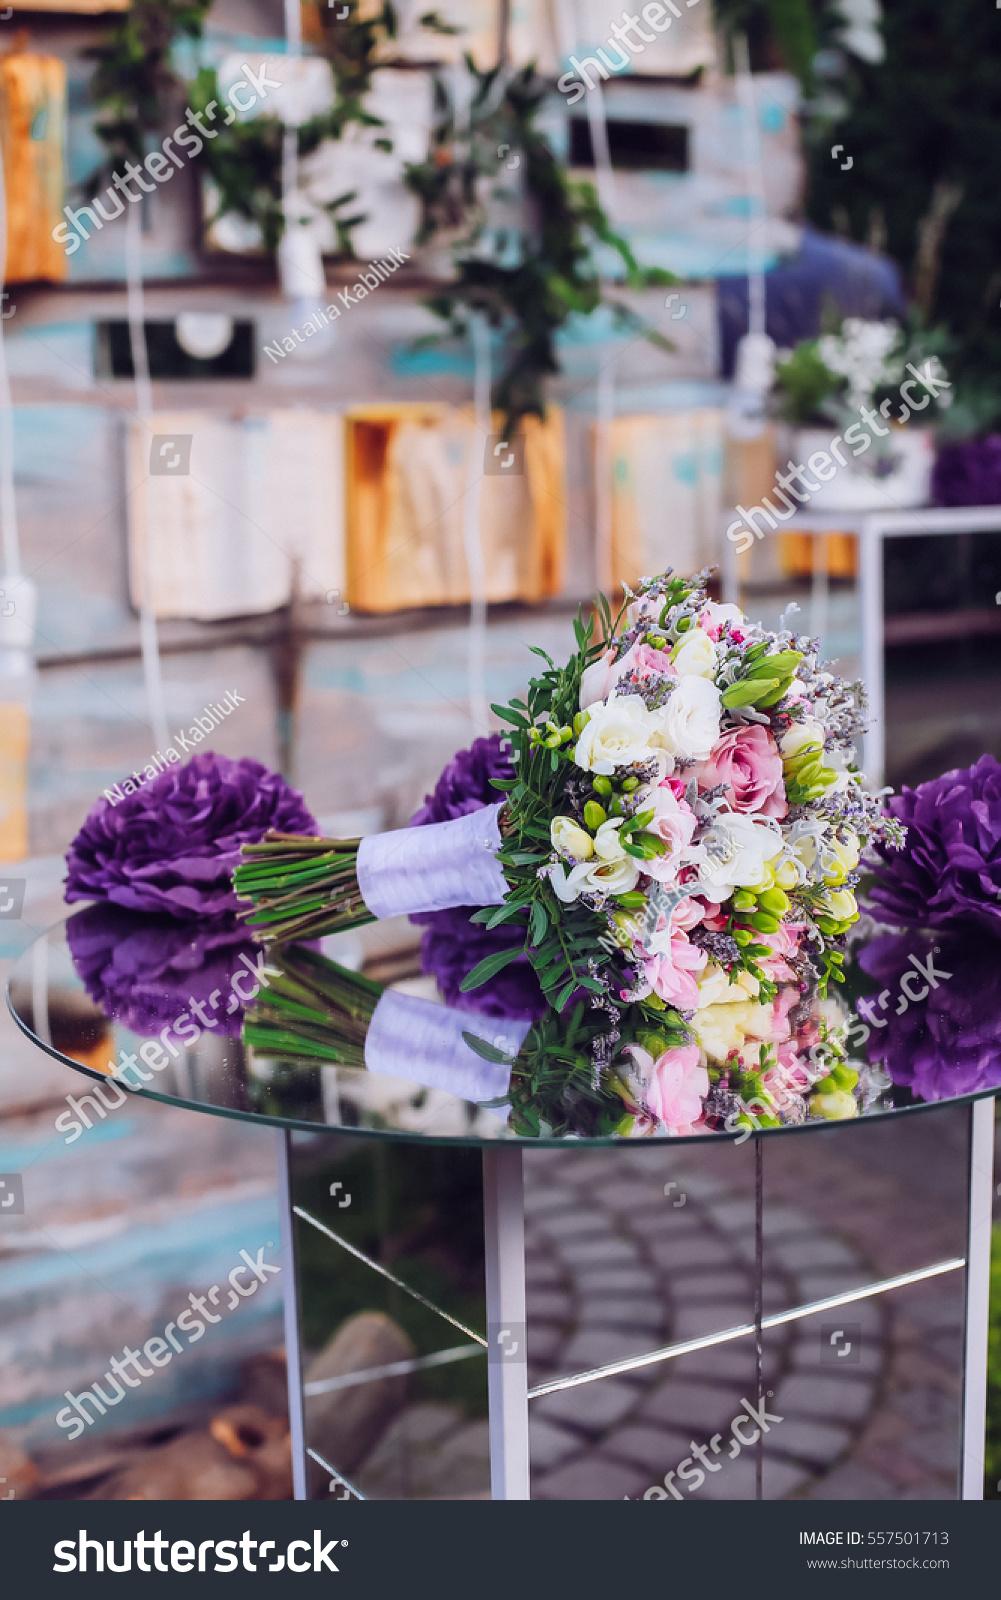 Beautiful Unusual Wedding Decor Rustic Style Stock Photo Edit Now 557501713